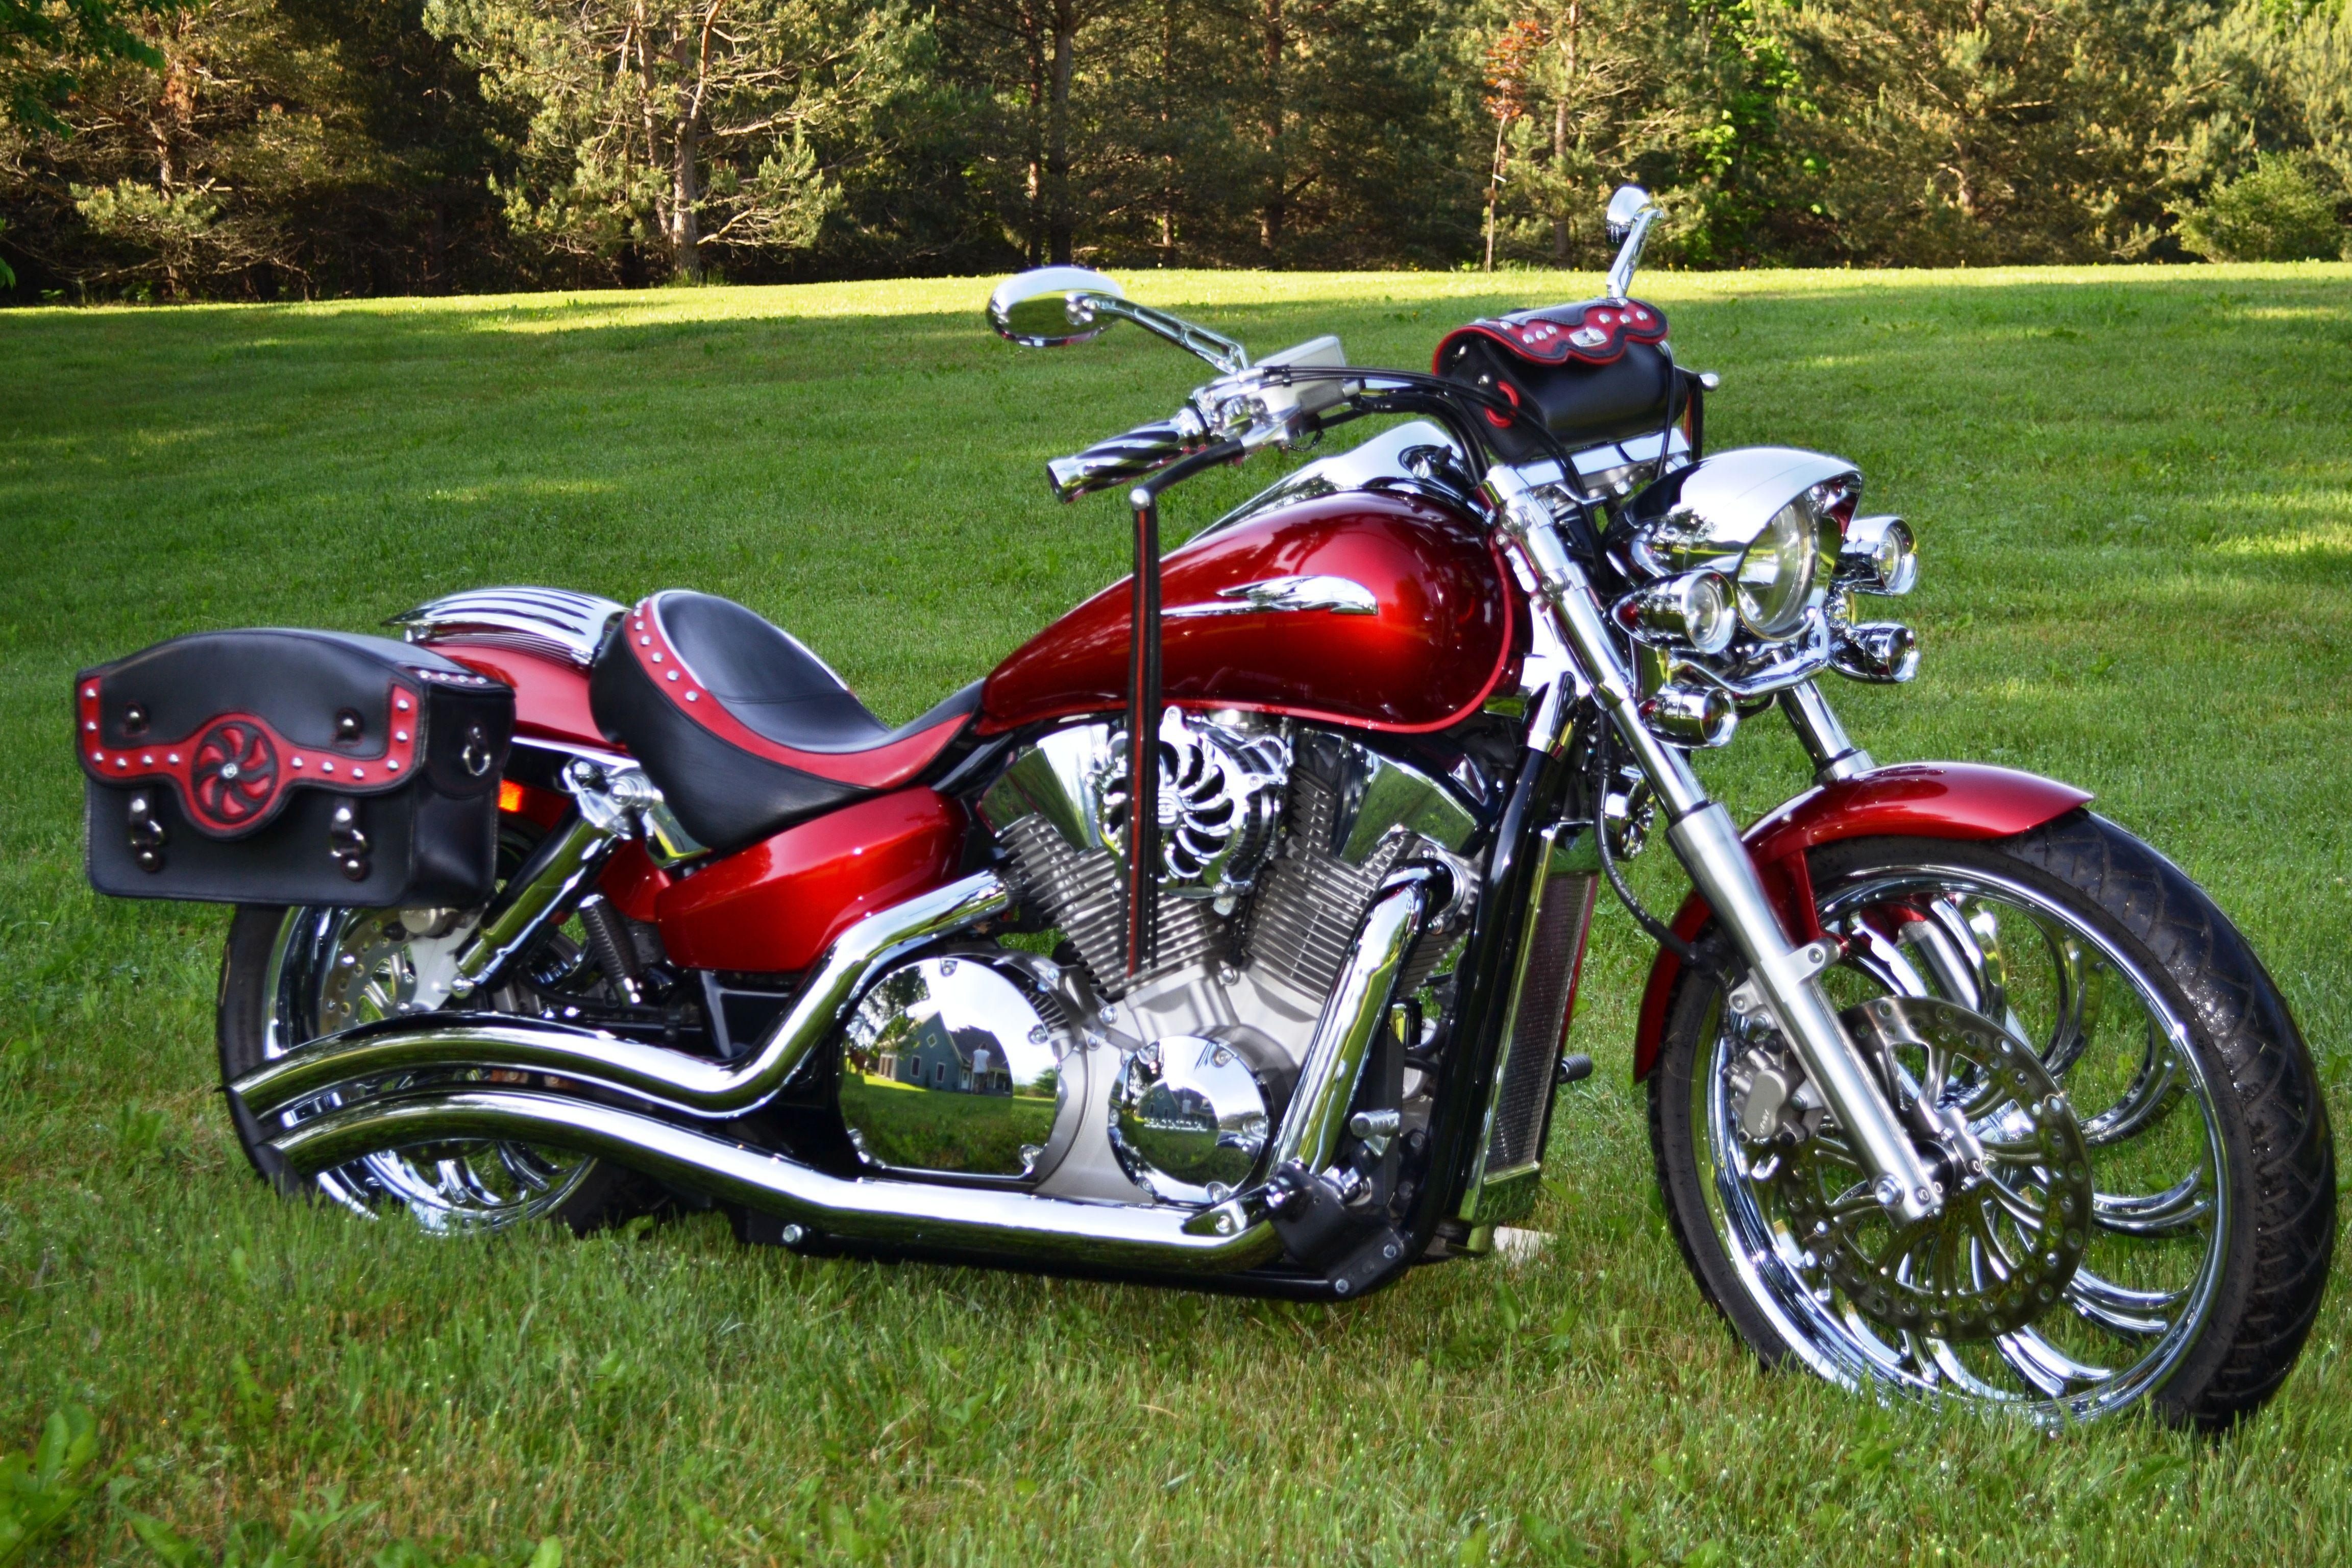 medium resolution of honda vtx with sweet caroline custom set saddlebags handlebar pouch and custom seat cover